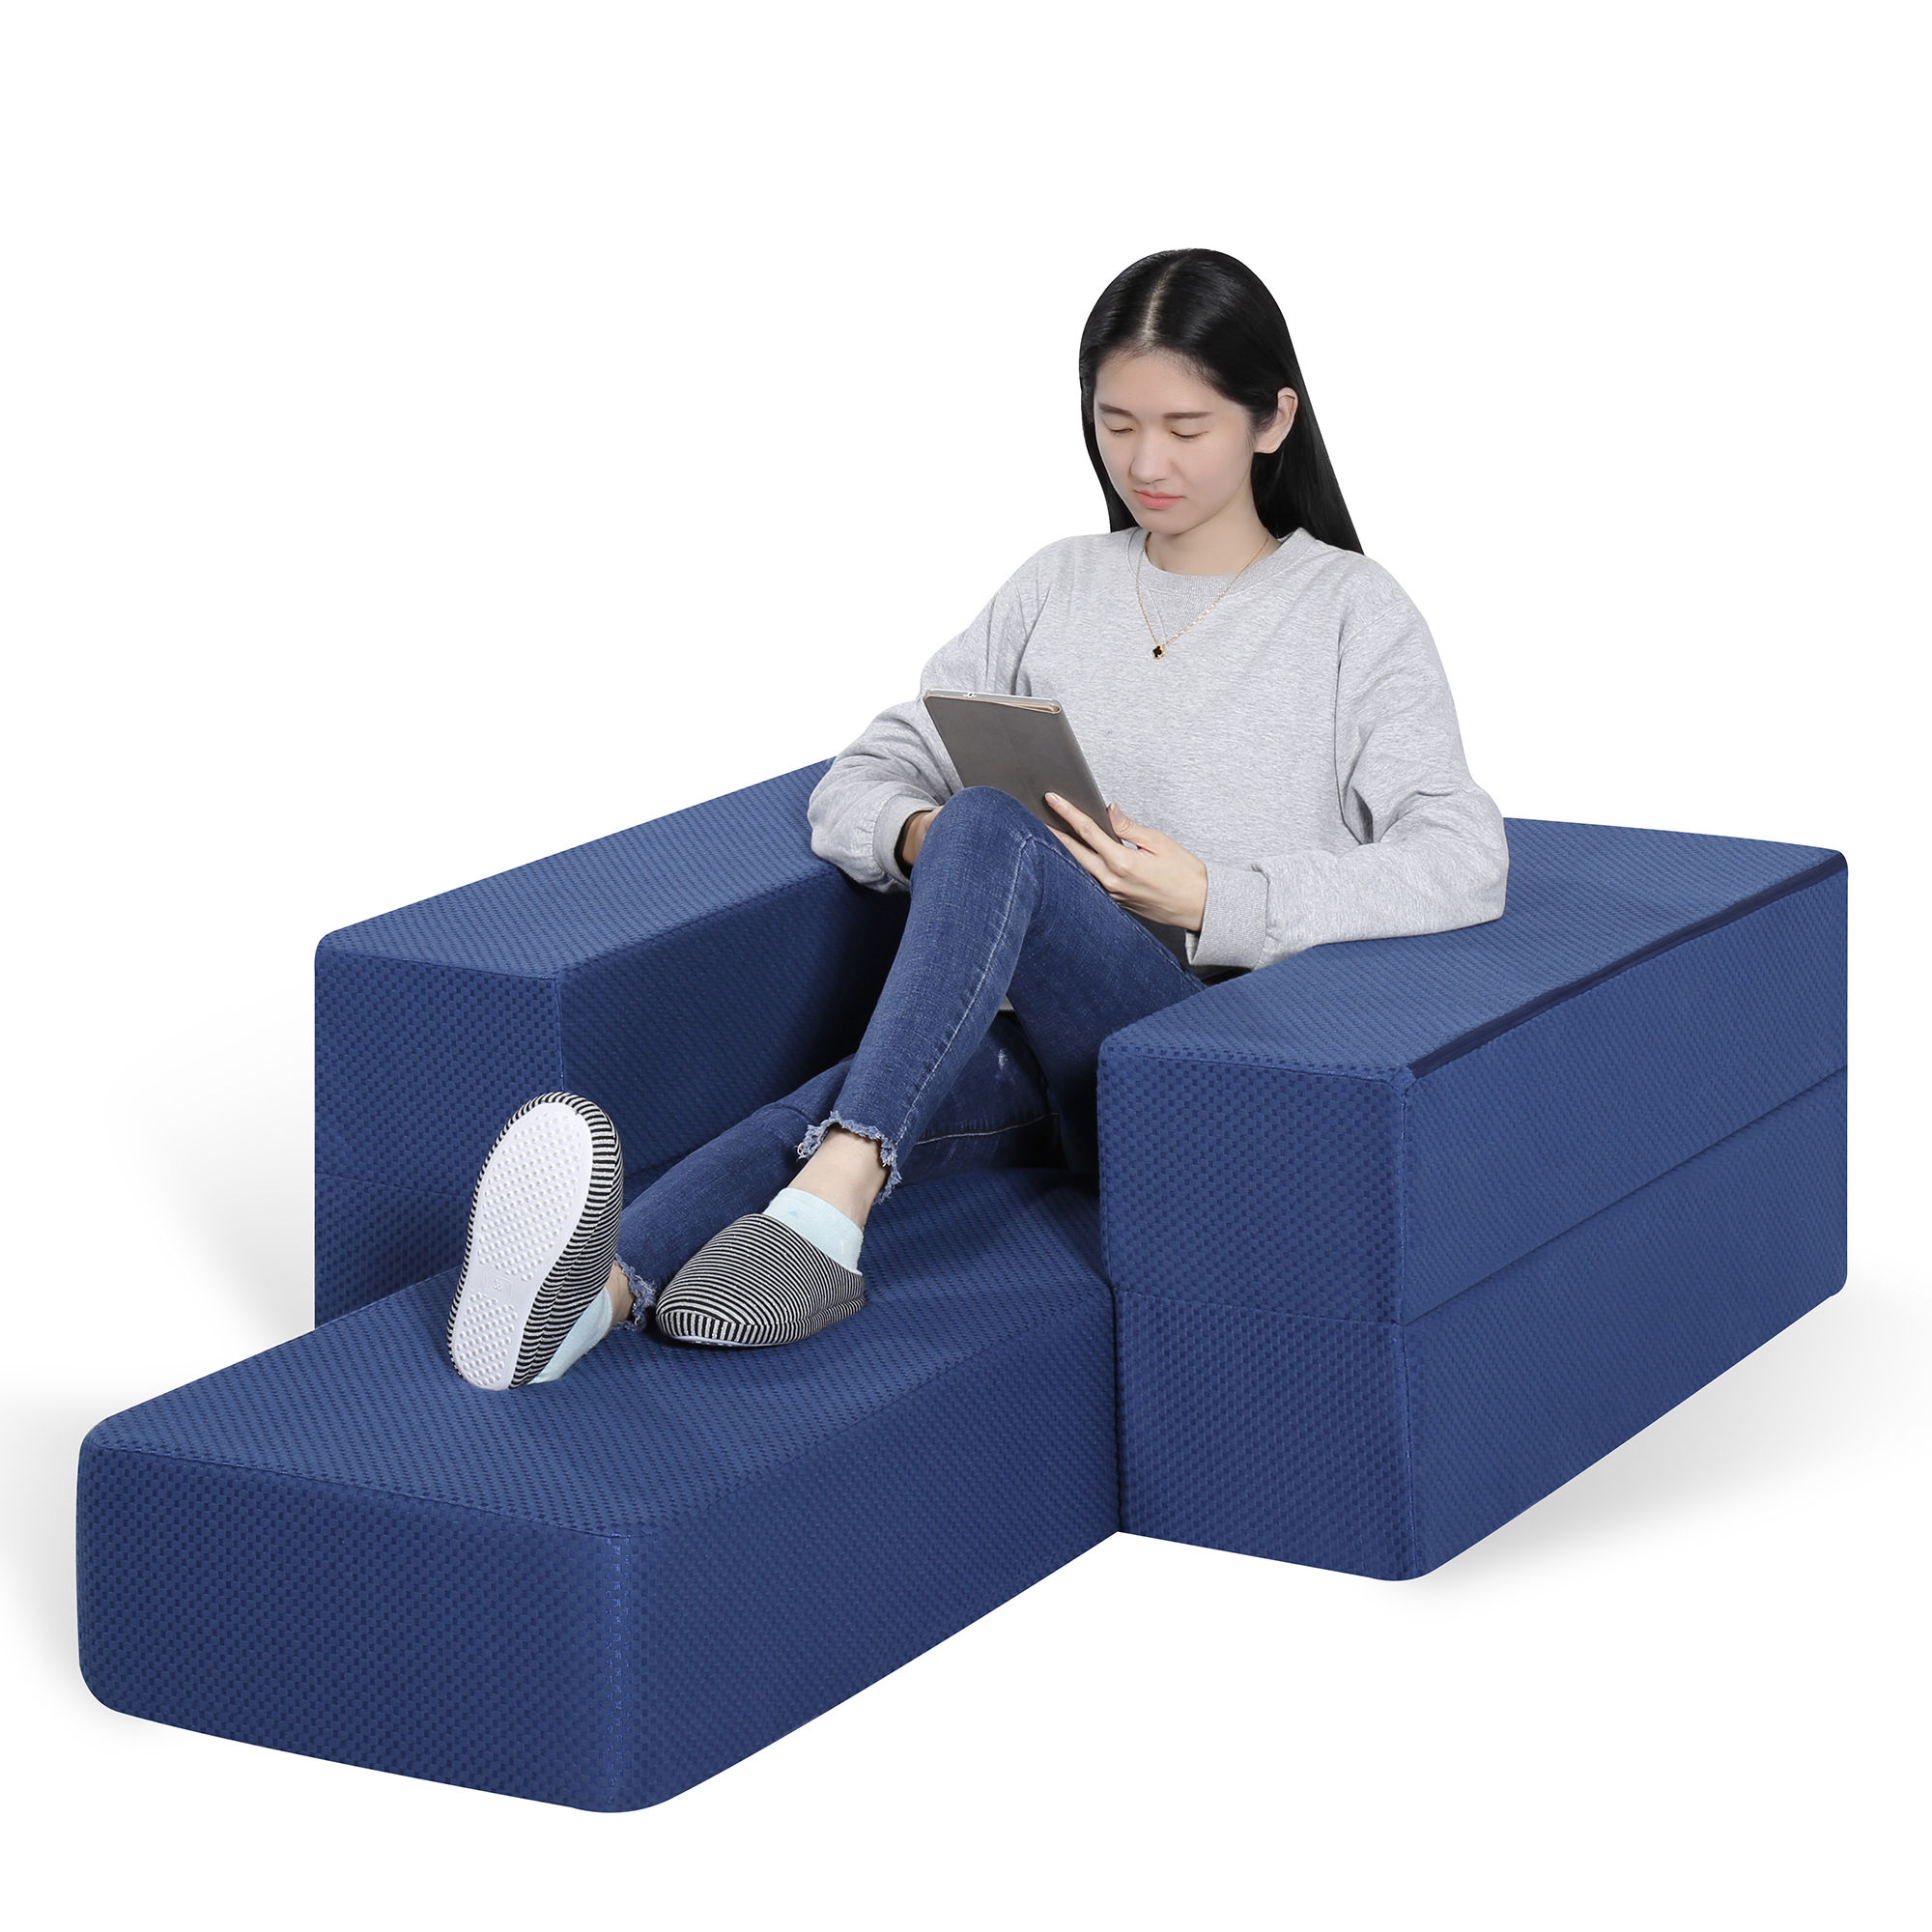 GranRest 8'' Mattress and Floor Sofa, I Gel Foam, Dark Blue